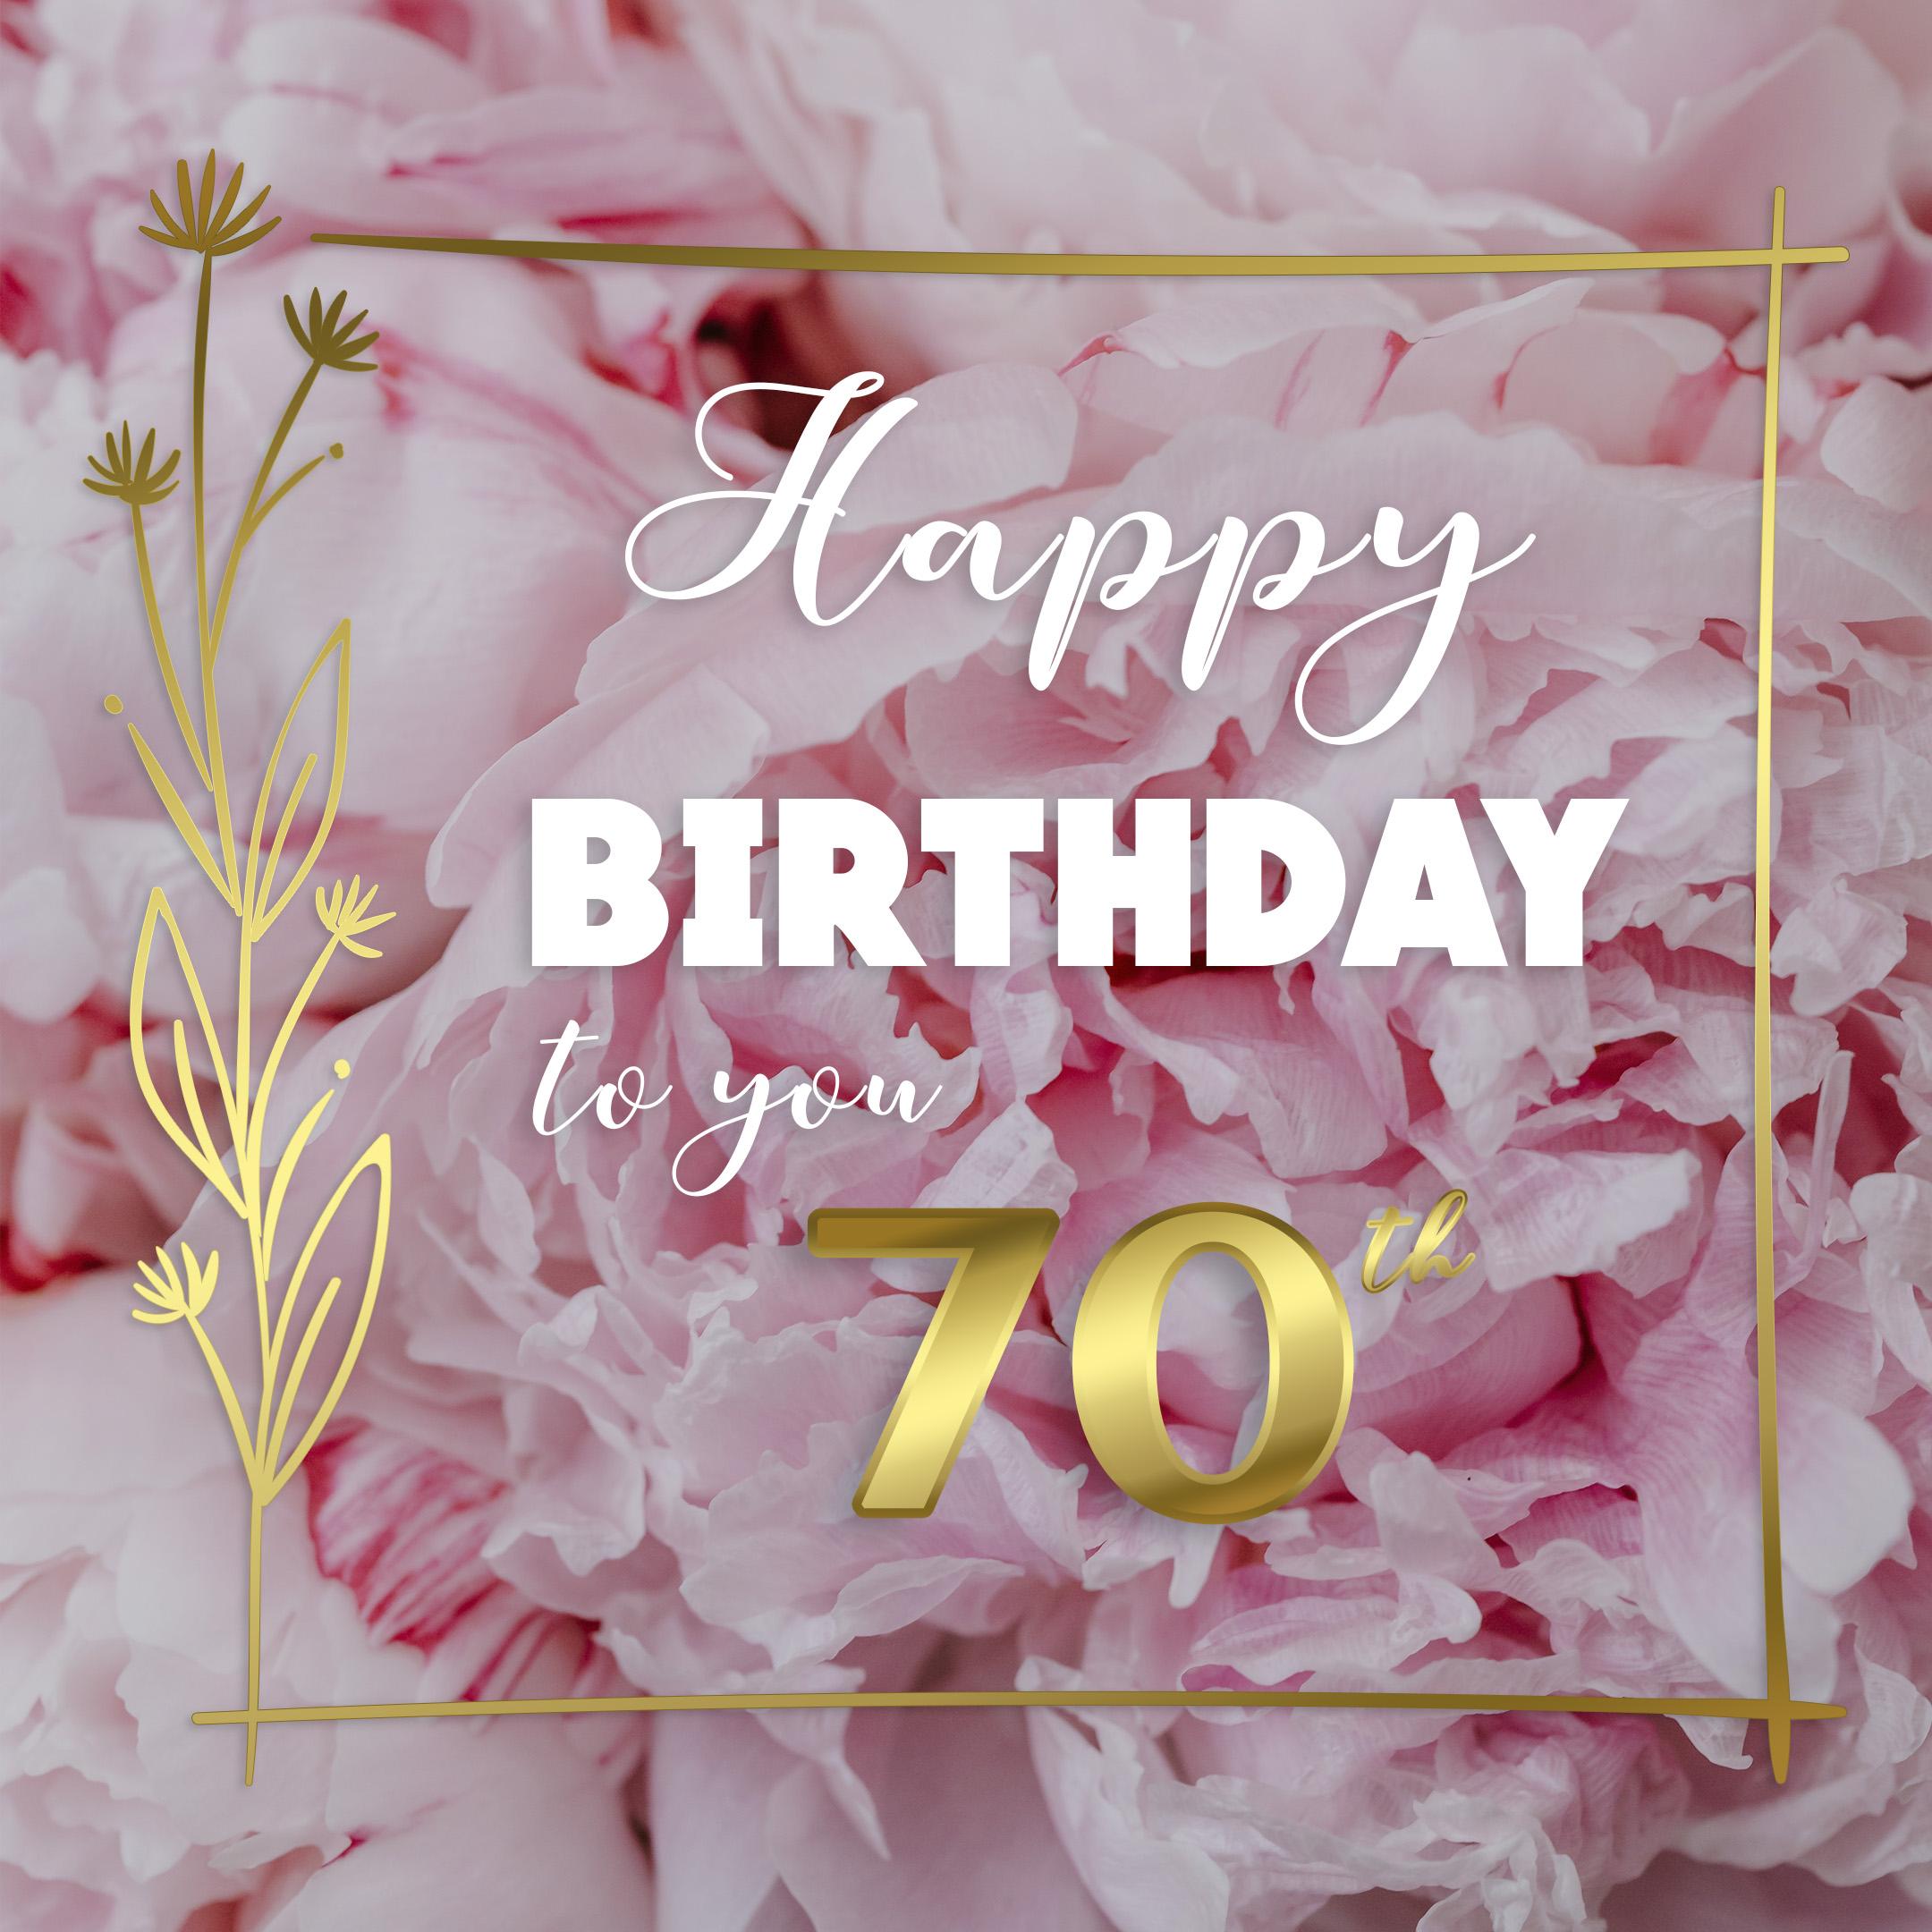 Free 70th Years Happy Birthday Image With Flowers - birthdayimg.com